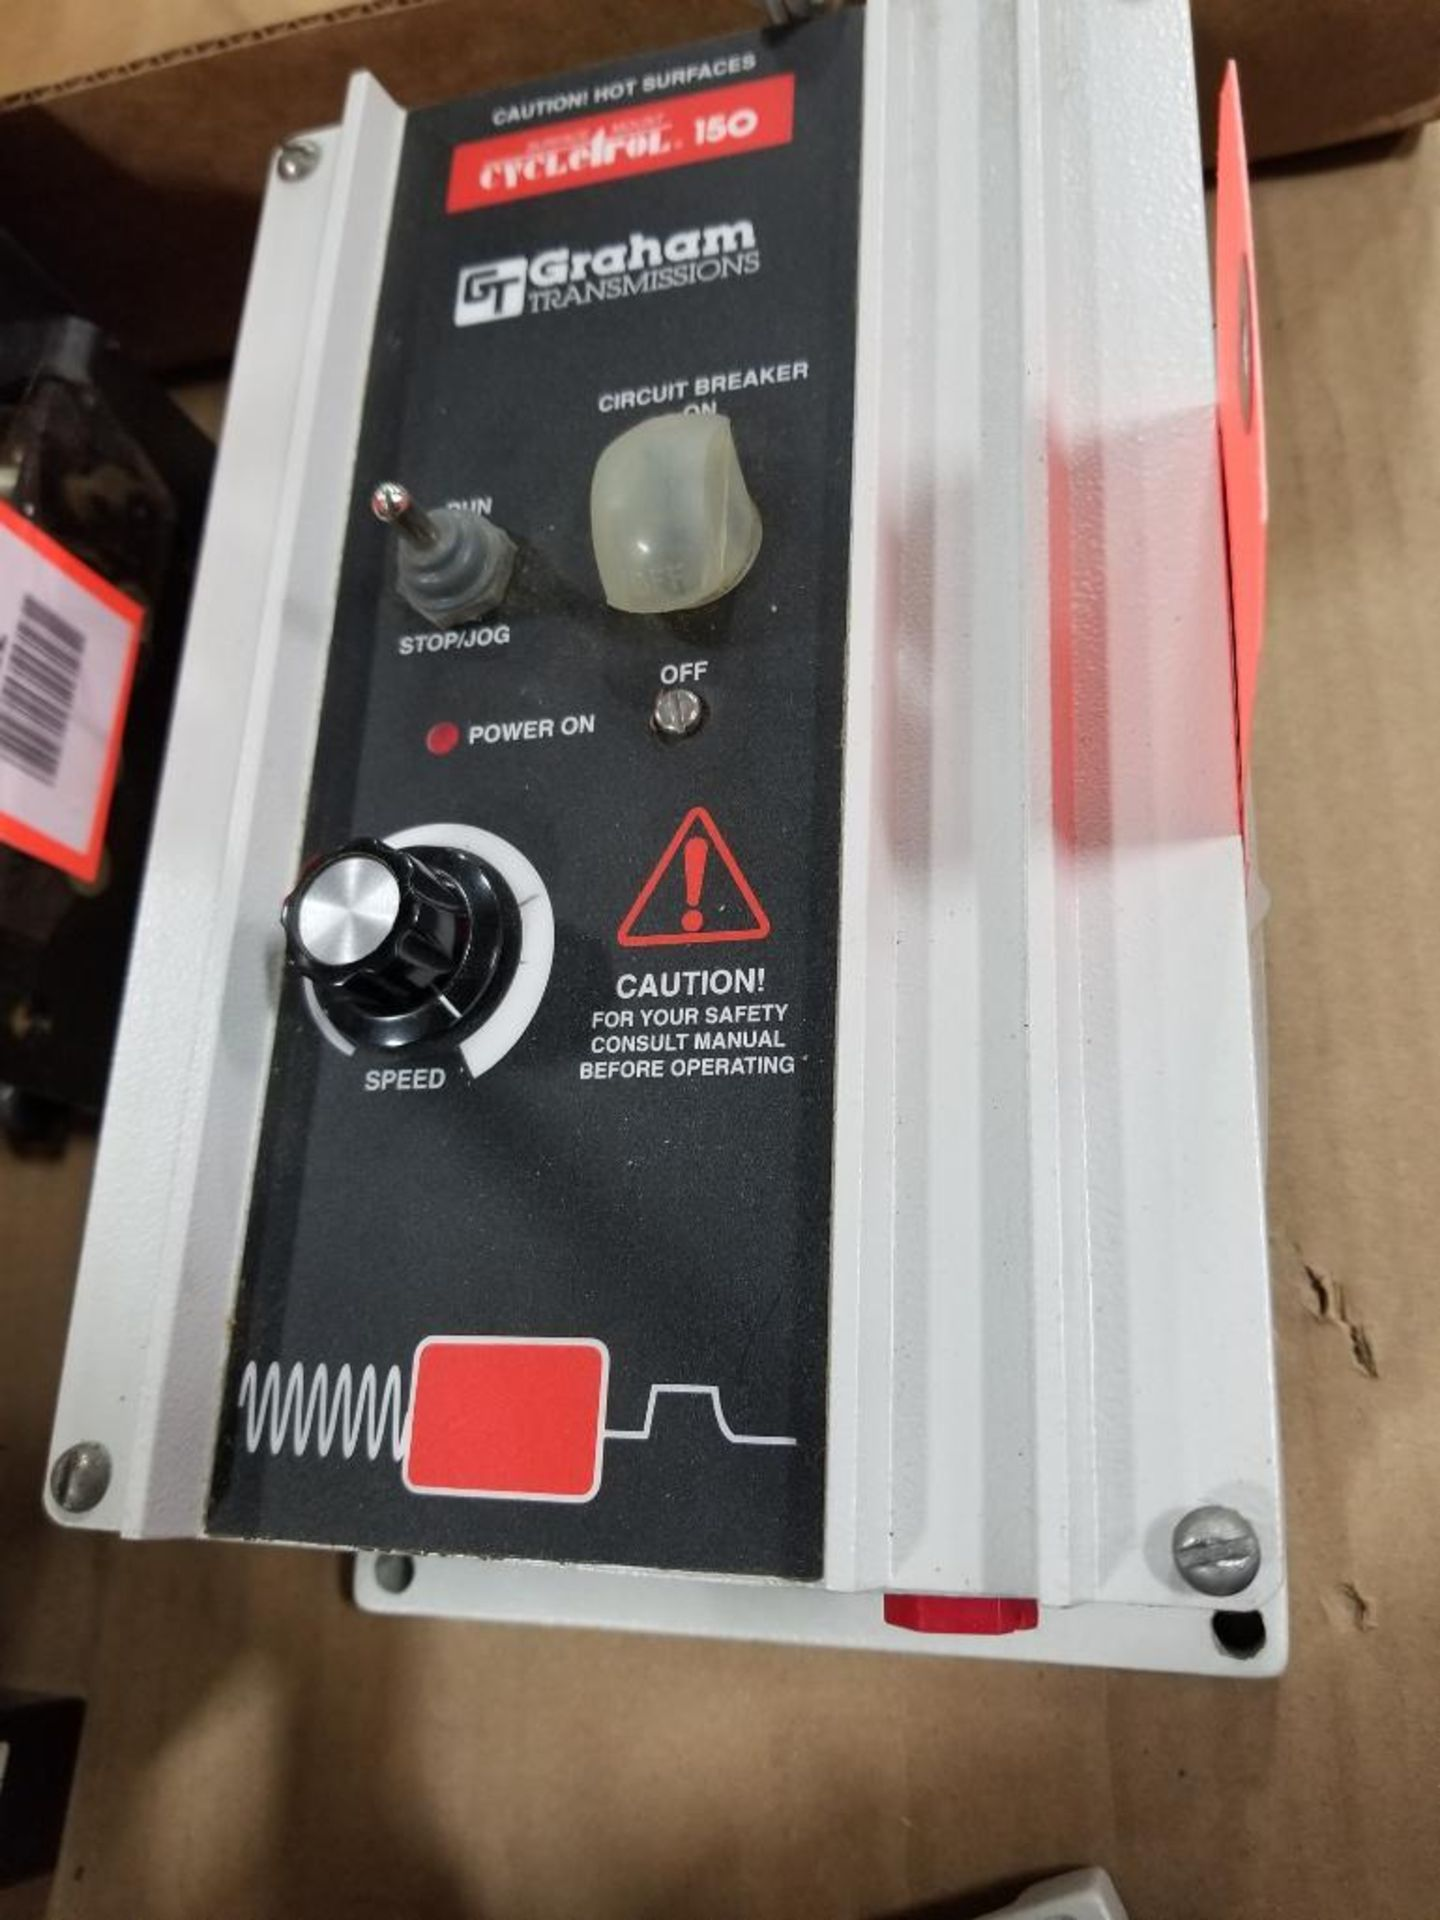 Graham Transmissions Cycletrol 150 DC motor controller. 176B6003.